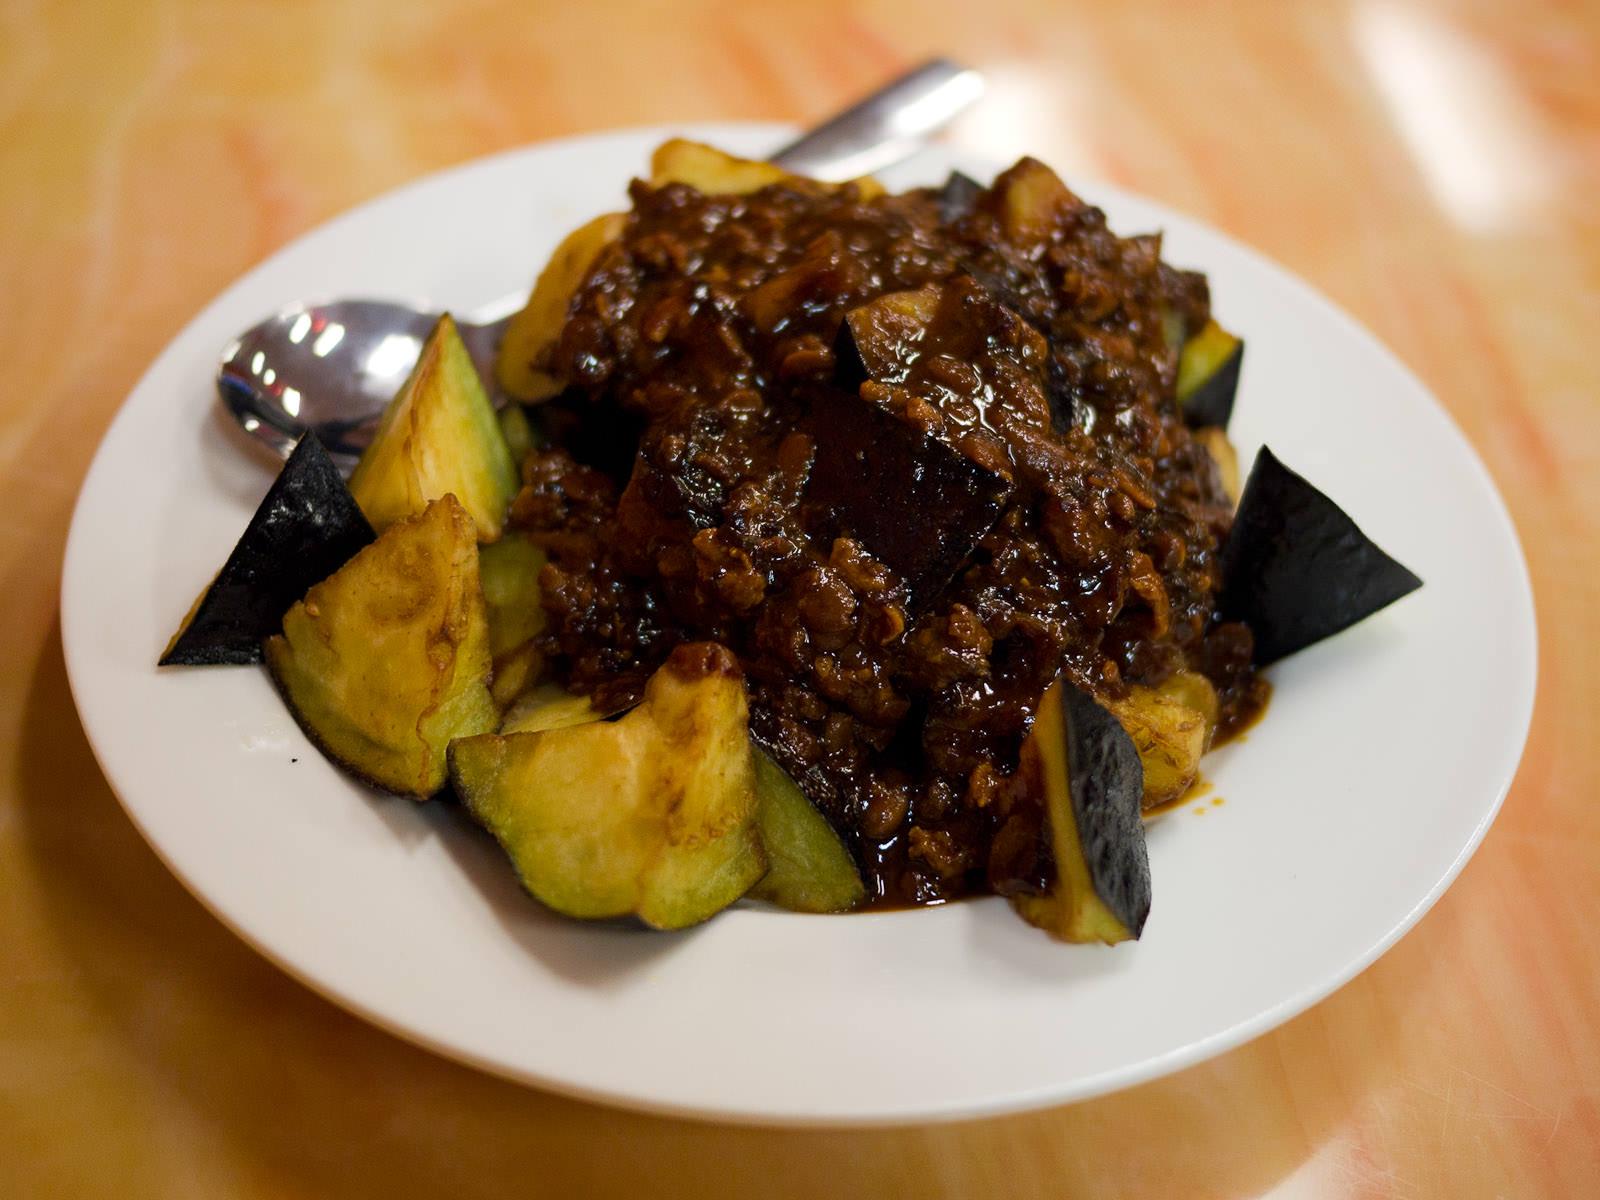 Eggplant, pork mince and brown sauce (AU$13)